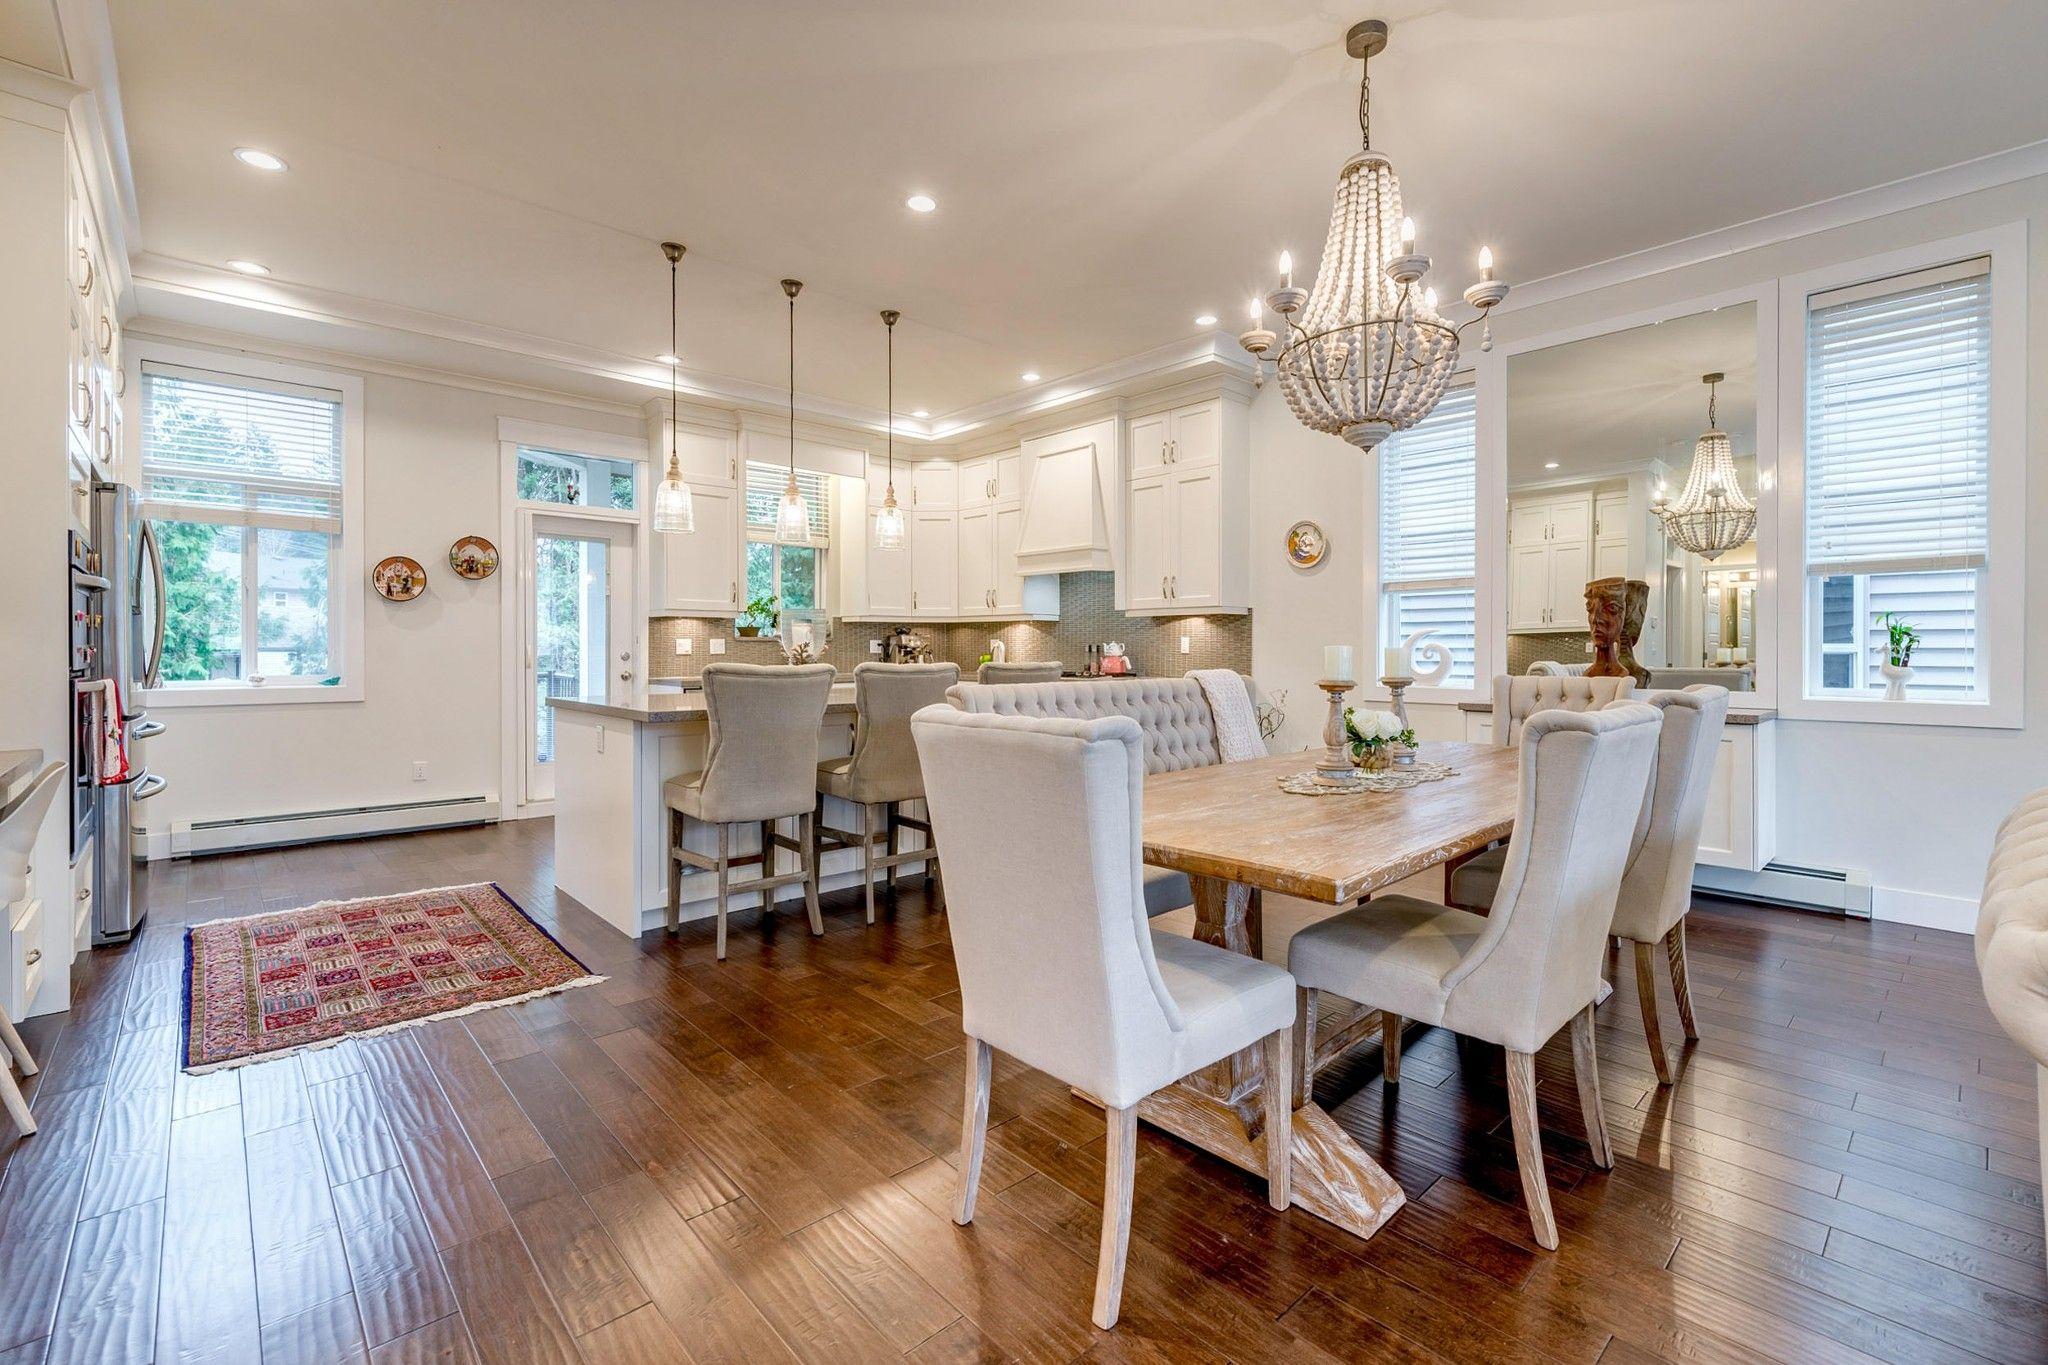 Photo 6: Photos: 1303 Hollybrook Street in Coquitlam: Burke Mountain House for sale : MLS®# R2423196